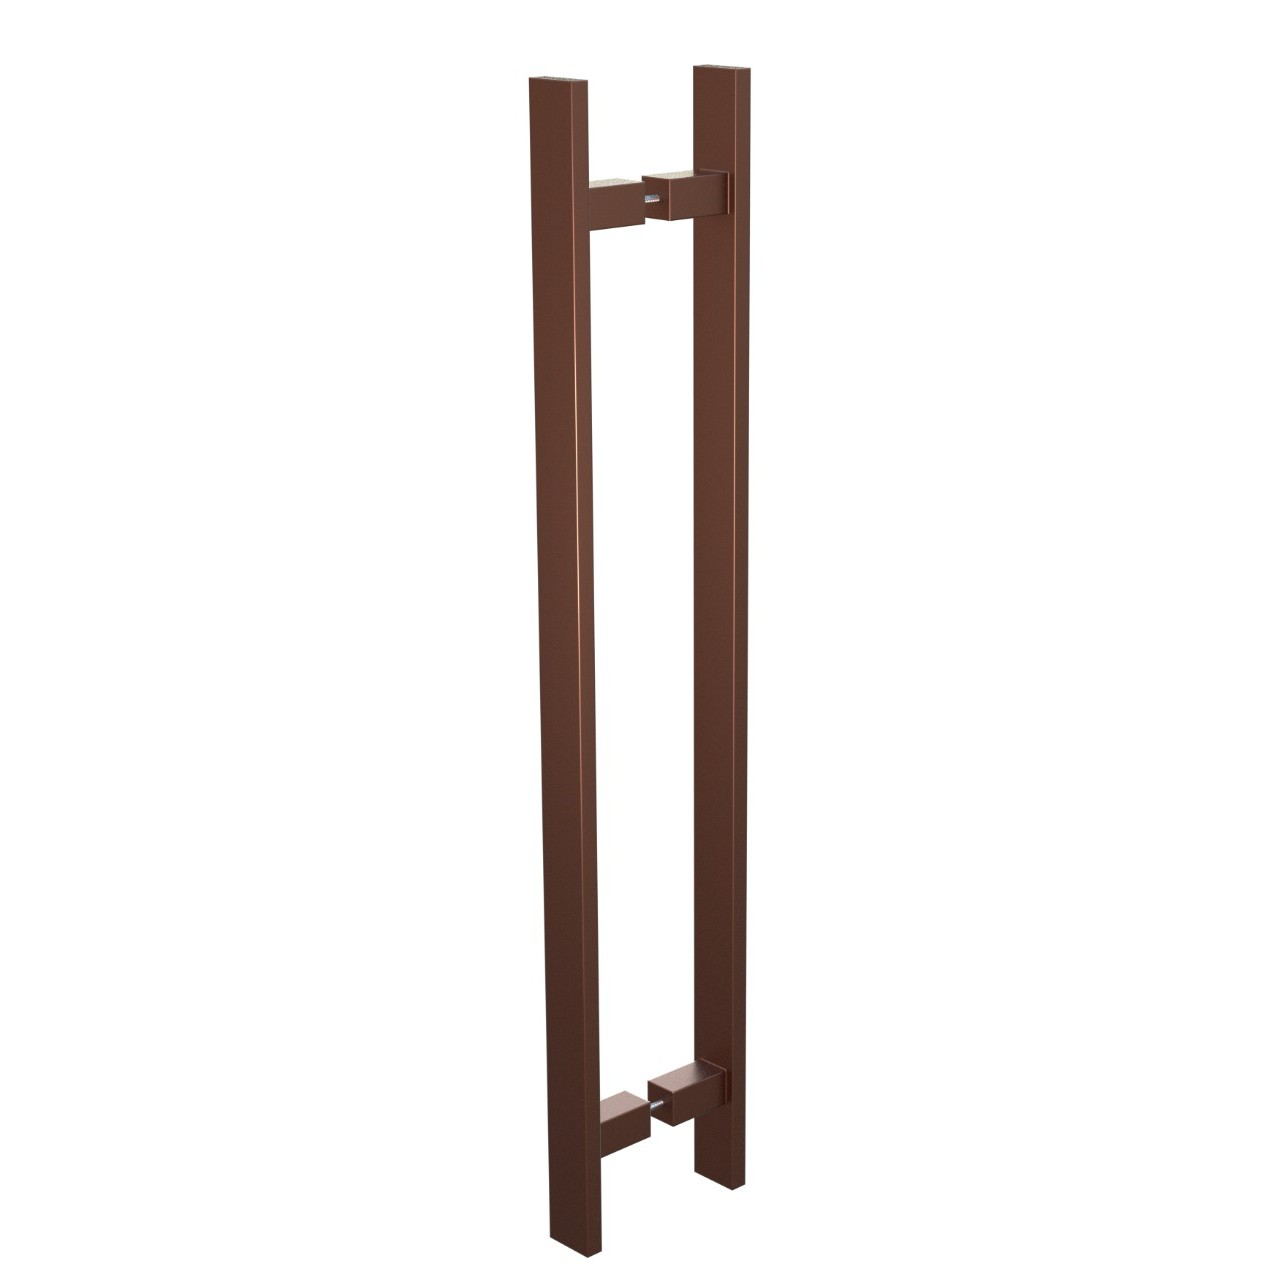 Puxador de Portas Sobrepor Aco Inox 60cm 1 par Trio Bronze - Acobrasil